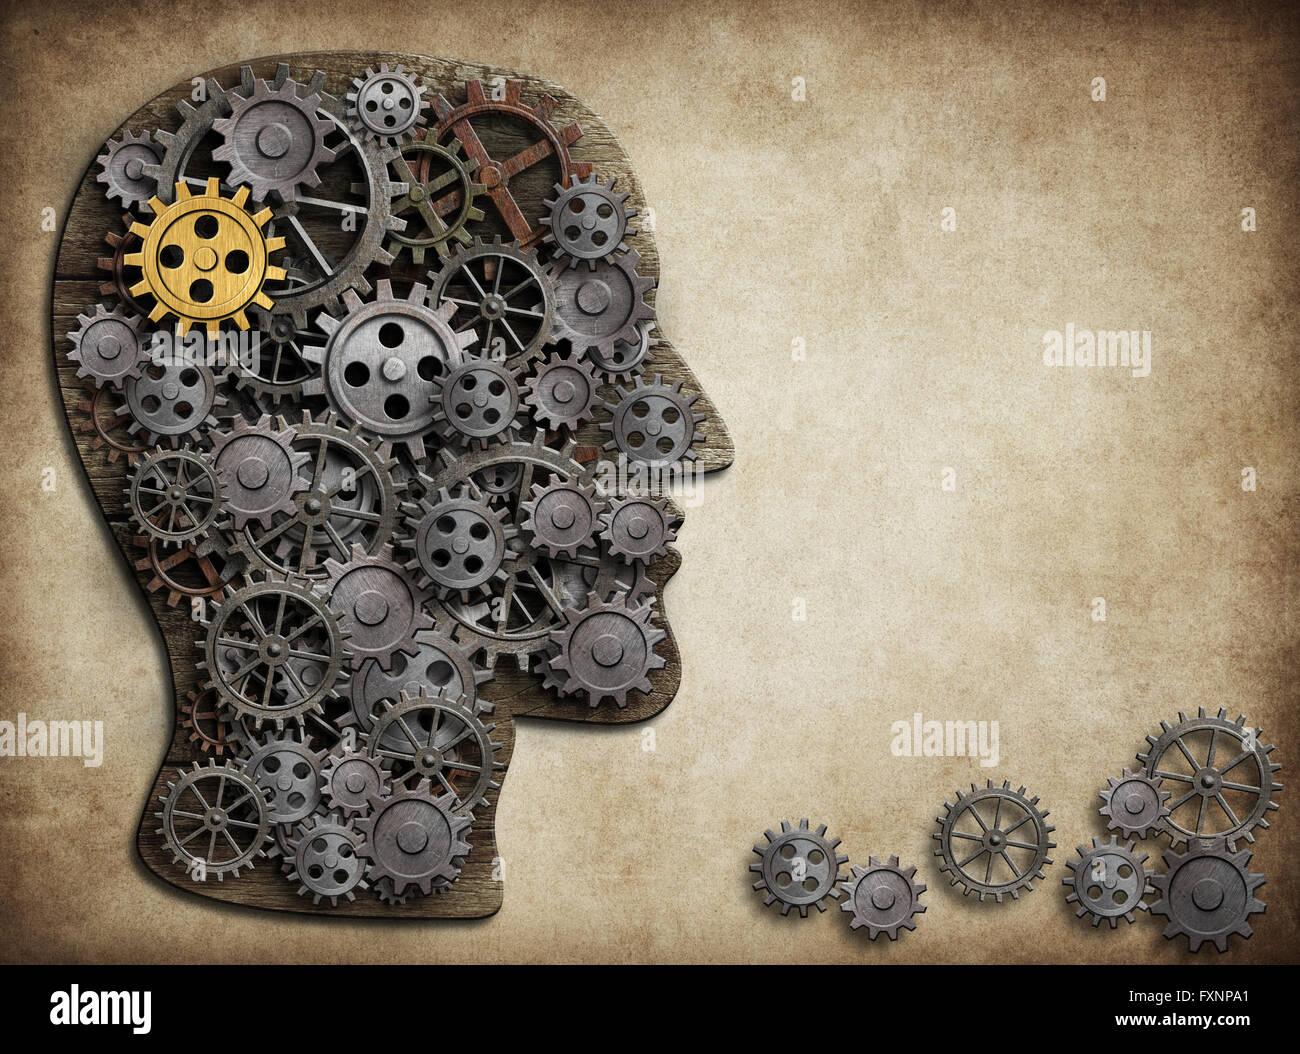 Brain gears and cogs, idea concept. - Stock Image